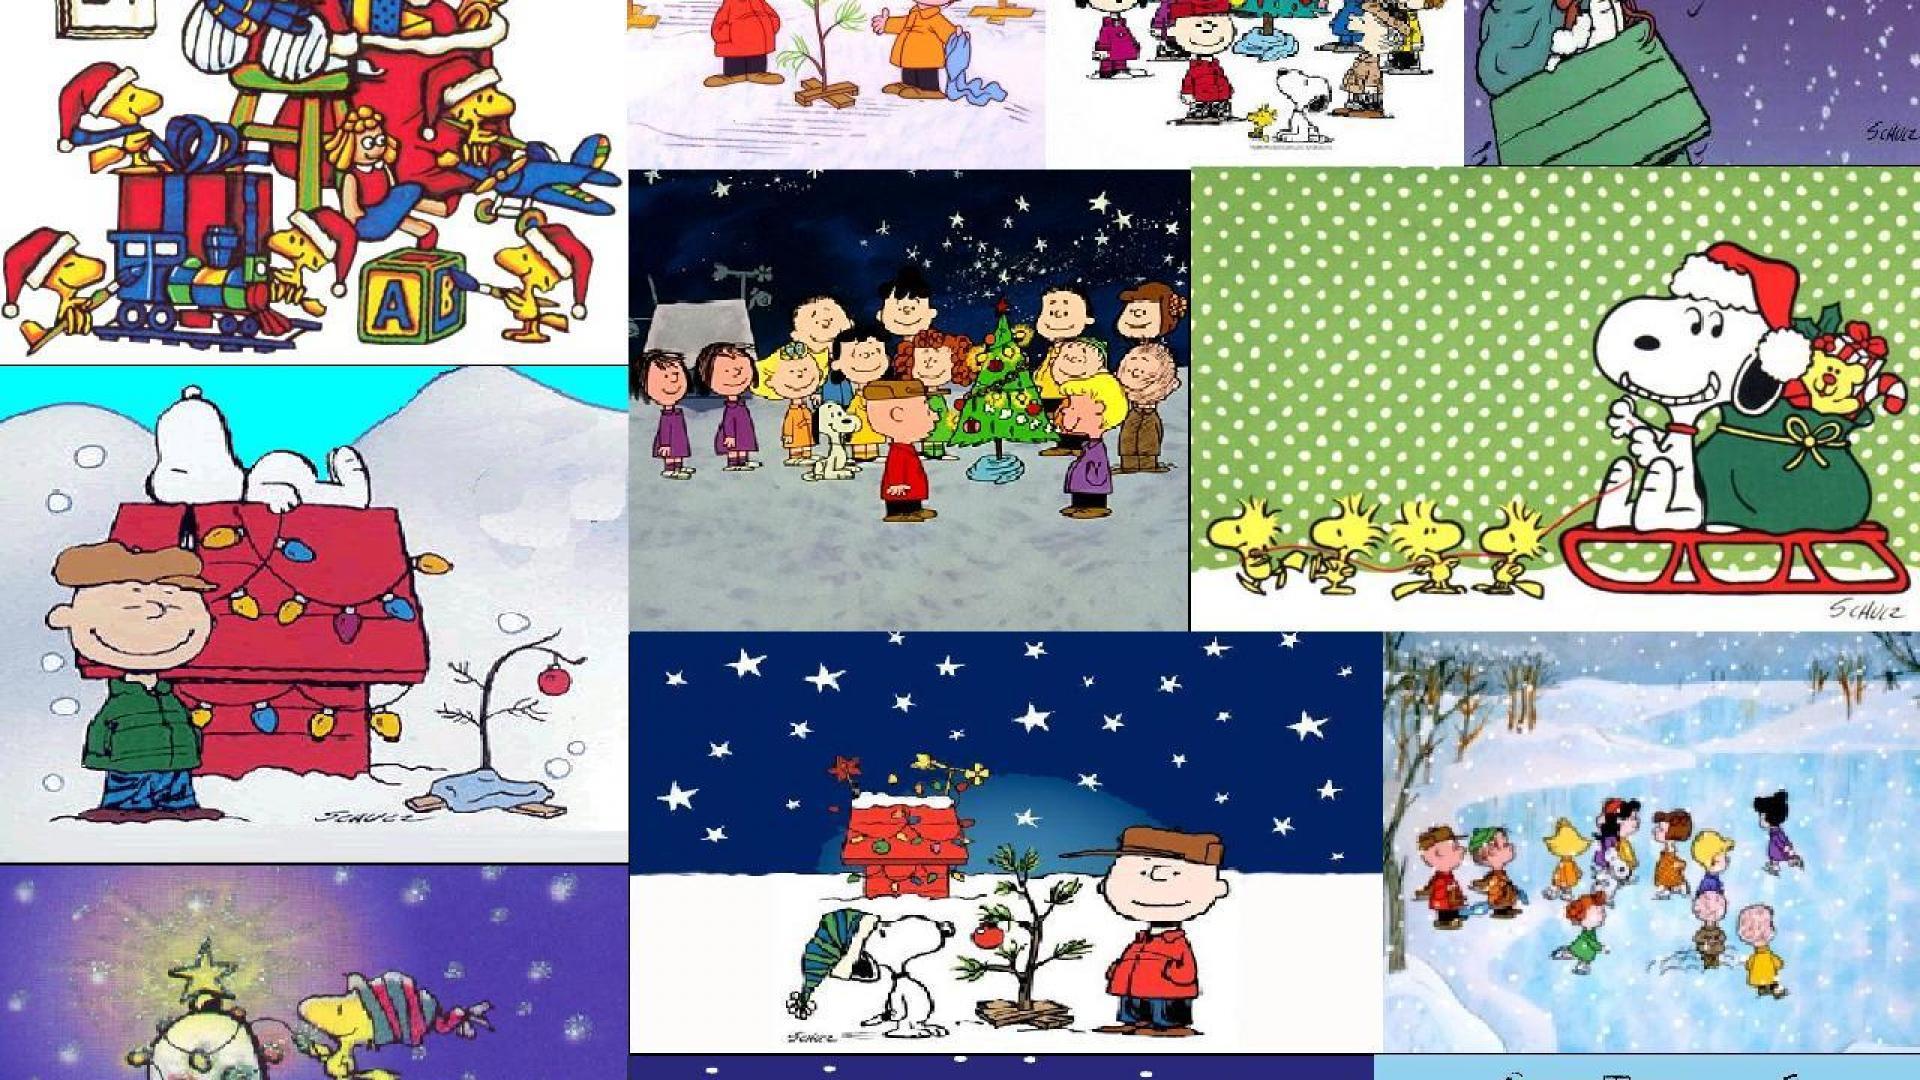 PEANUTS CHRISTMAS WALLPAPER   63578   HD Wallpapers   [desktopinHQ 1920x1080